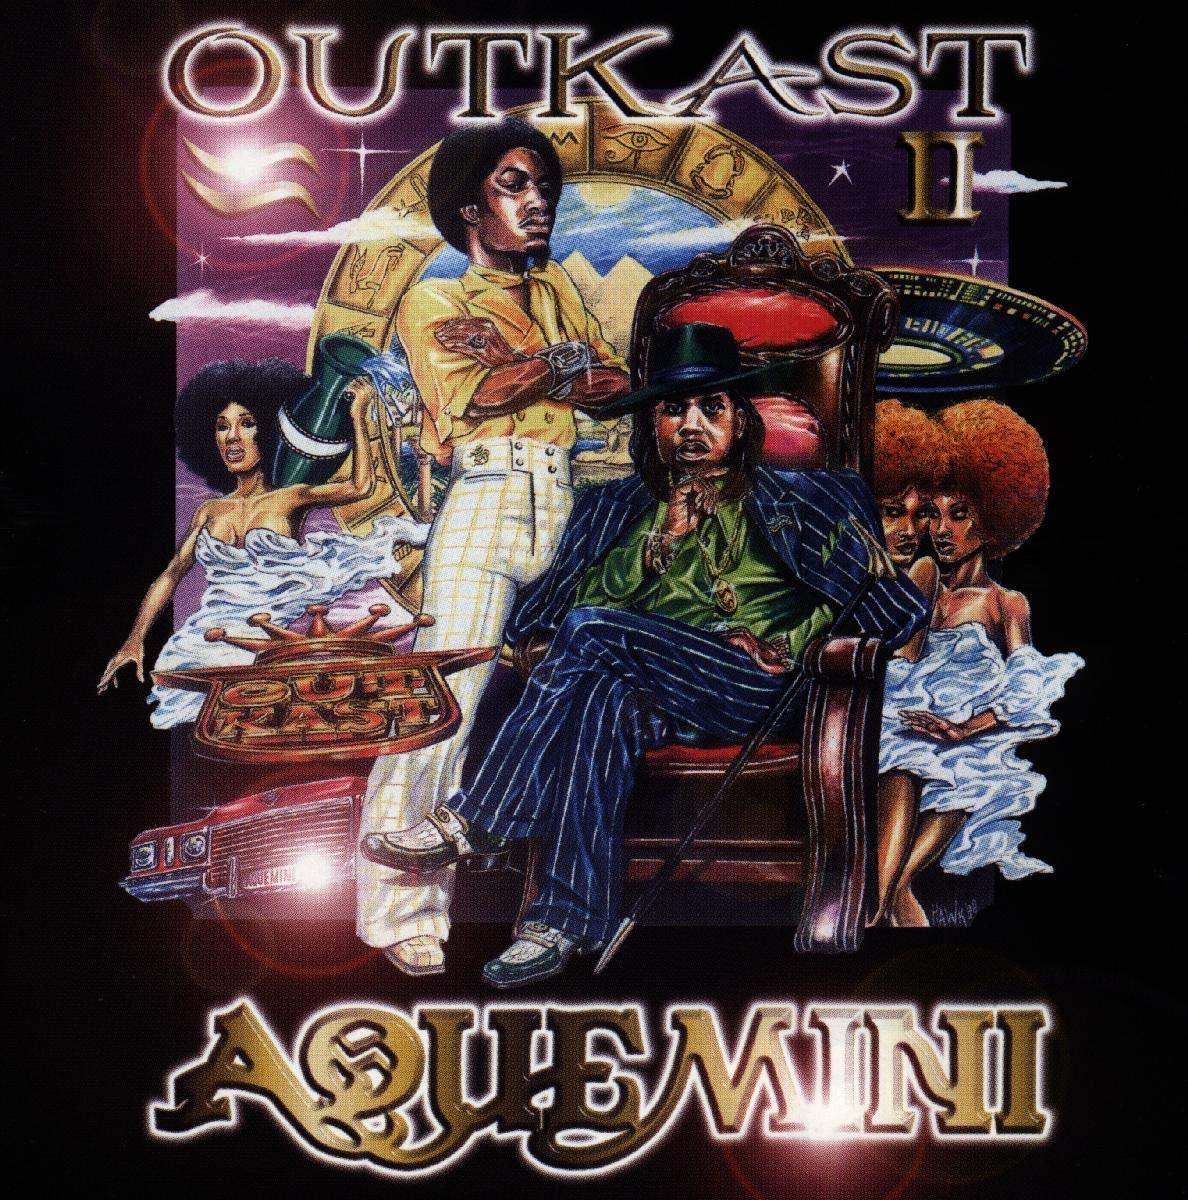 Outkast-Aquameni-1625270647